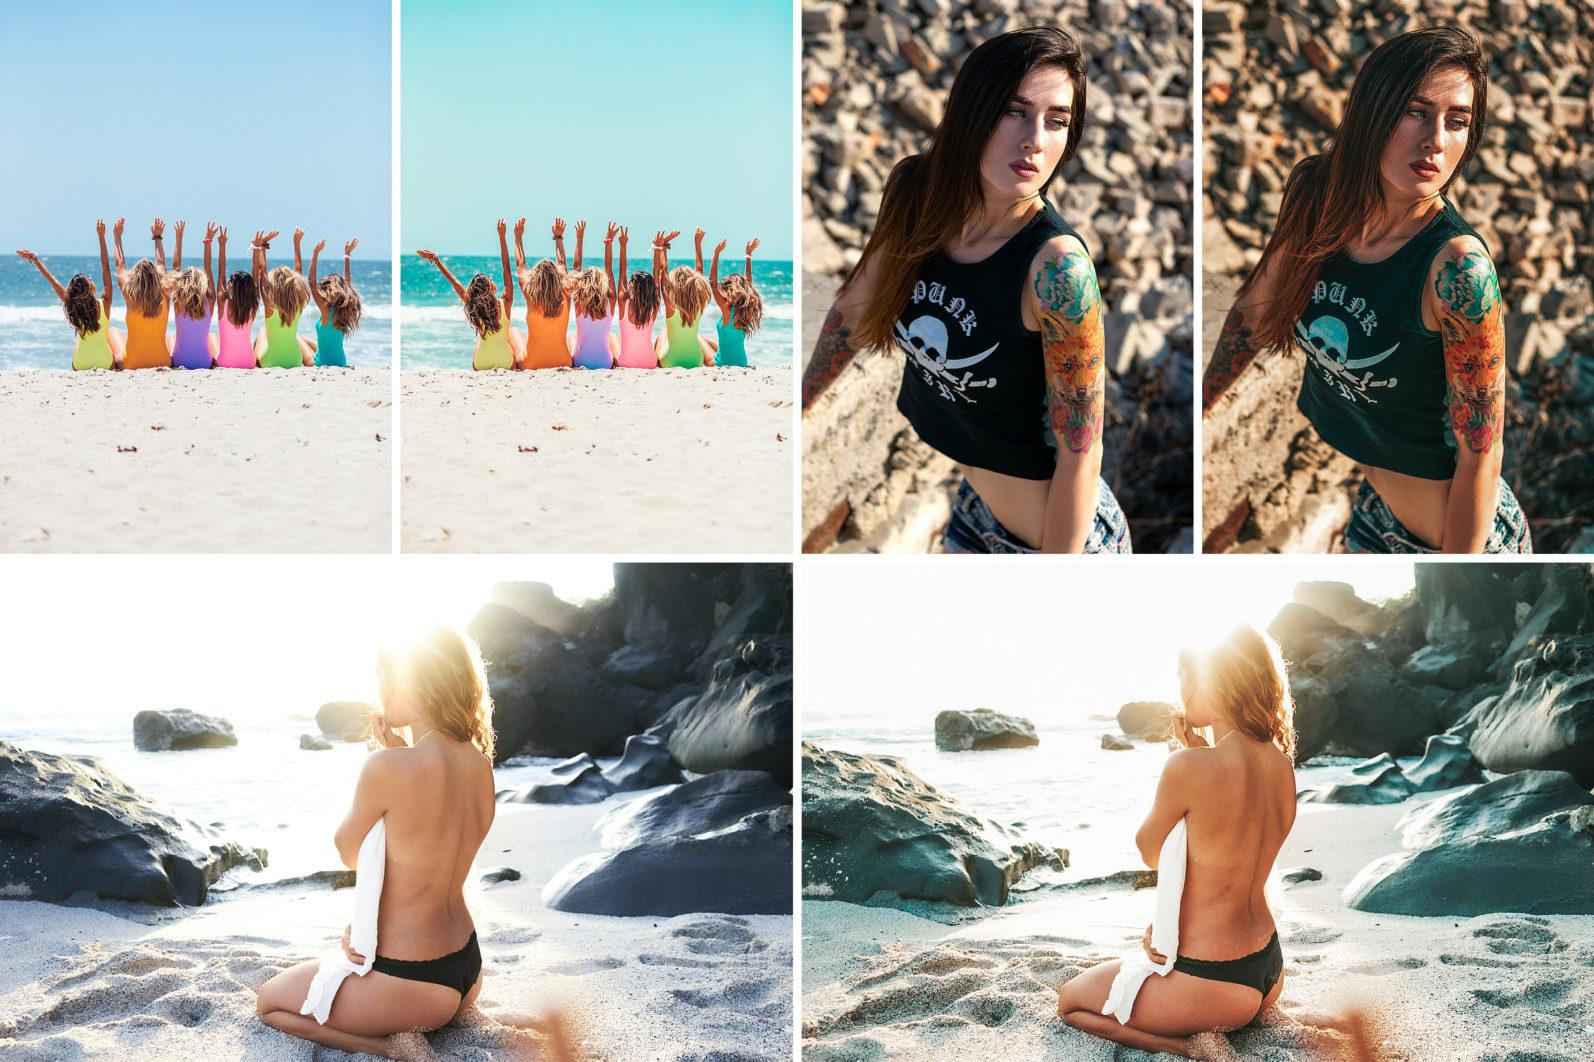 106. Beach Soul Presets - 106.BEACHSOUL 7 -